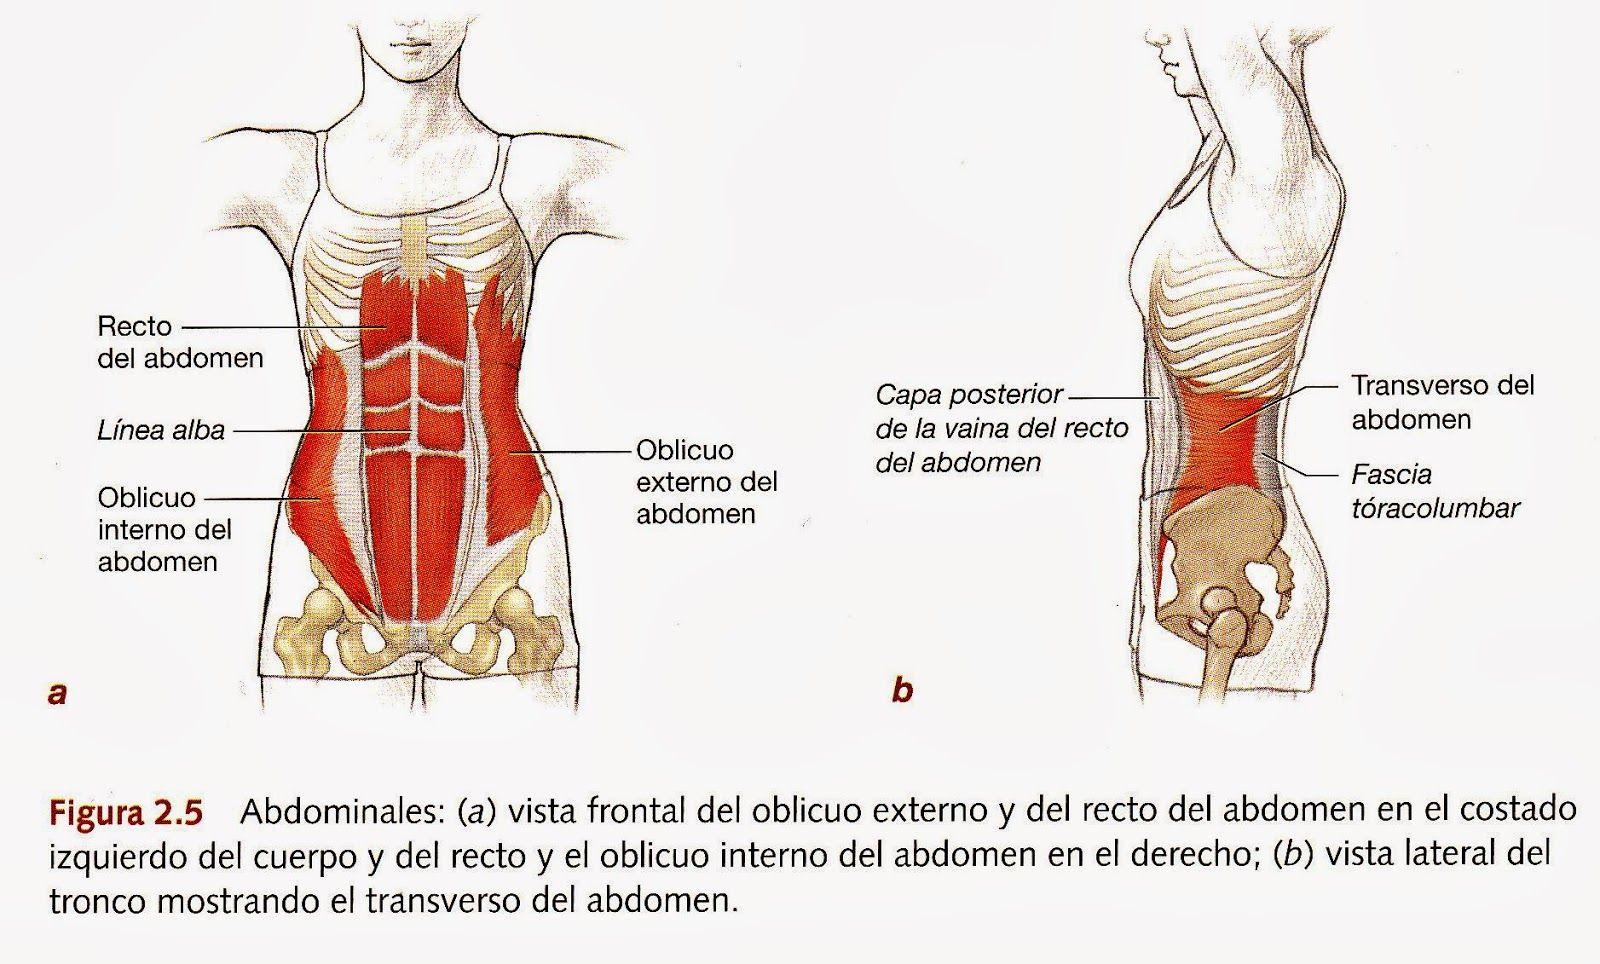 figura 2.5 transverso del abdomen pilates david belio